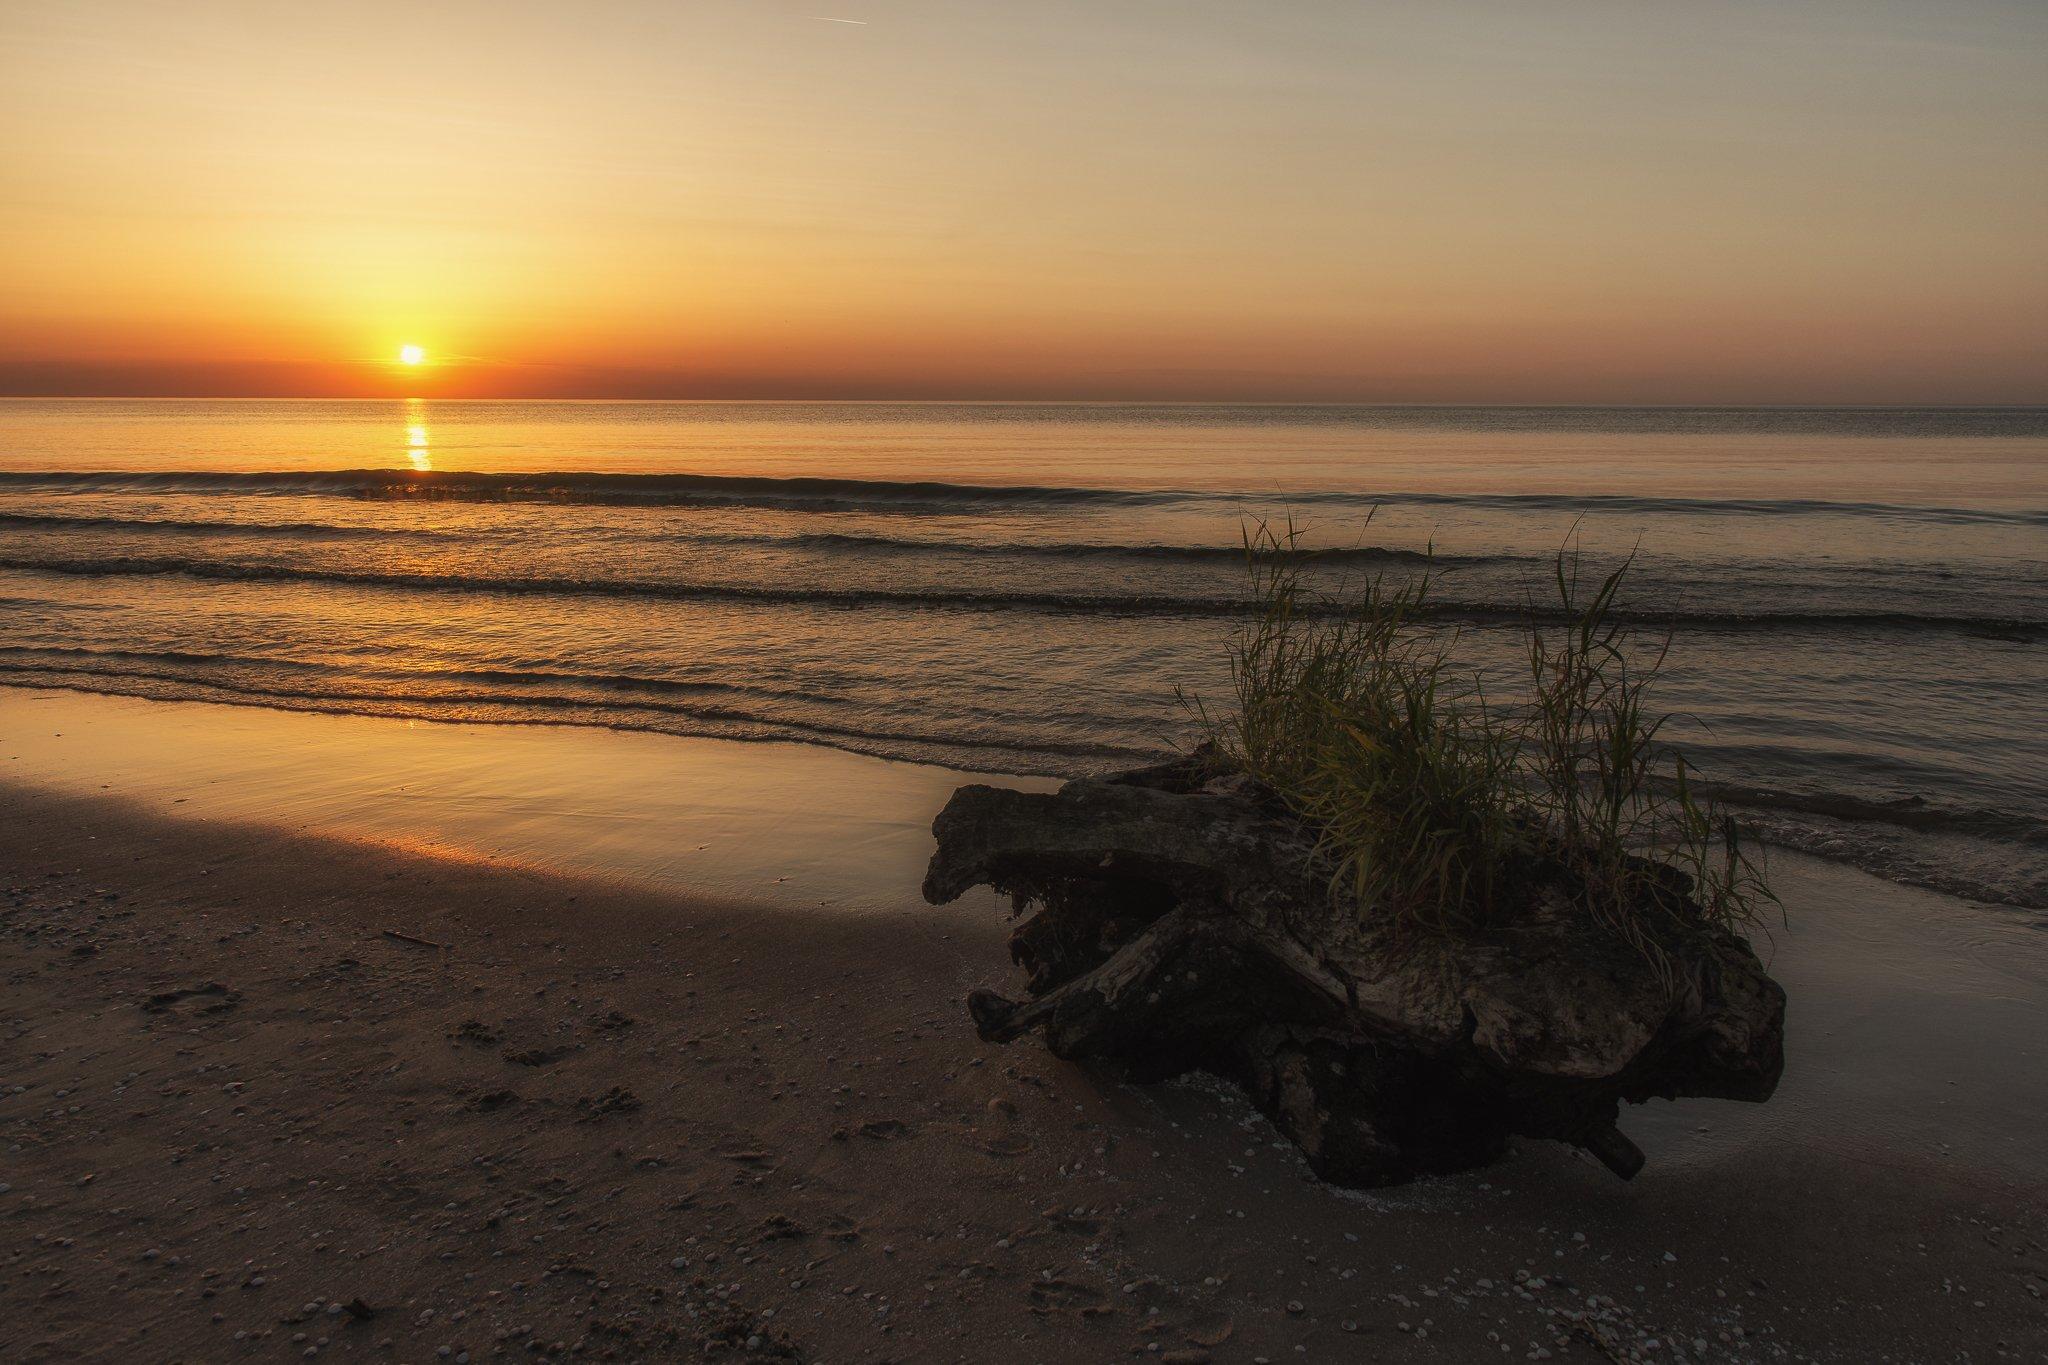 sunset,beach,sand,sea,seascape, Marcin Mucharski